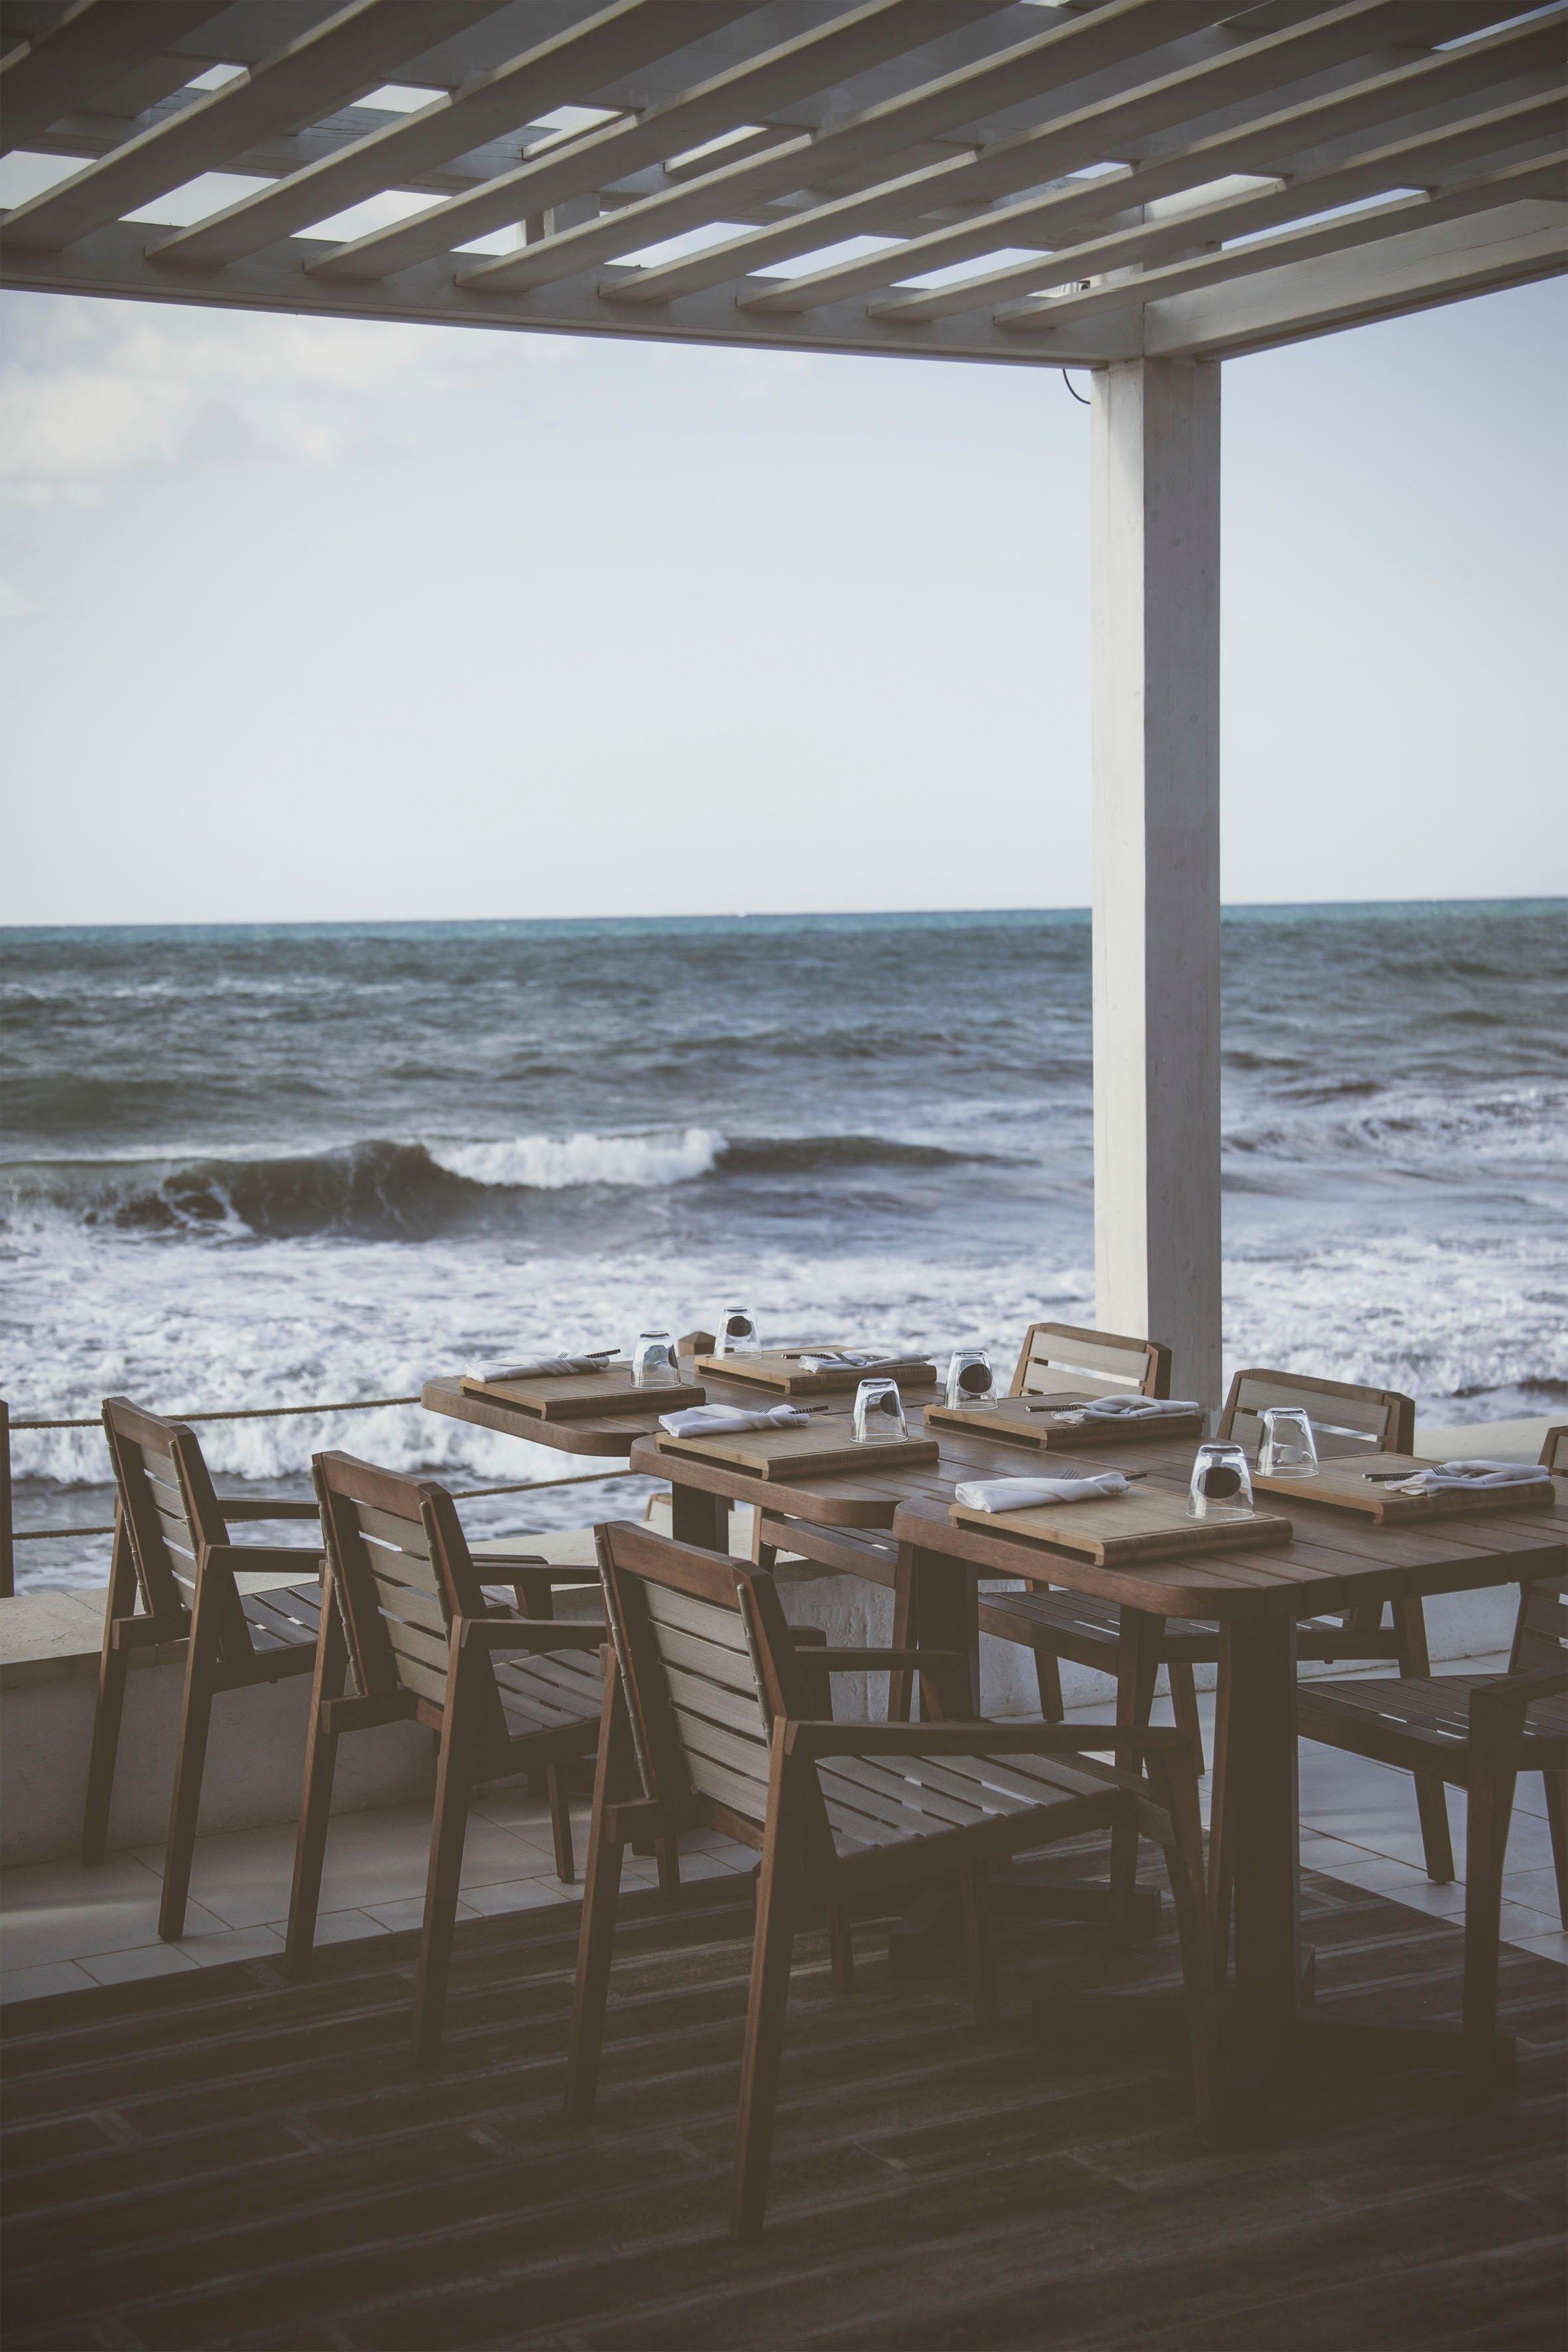 A restaurant by the ocean | Source: Unsplash.com